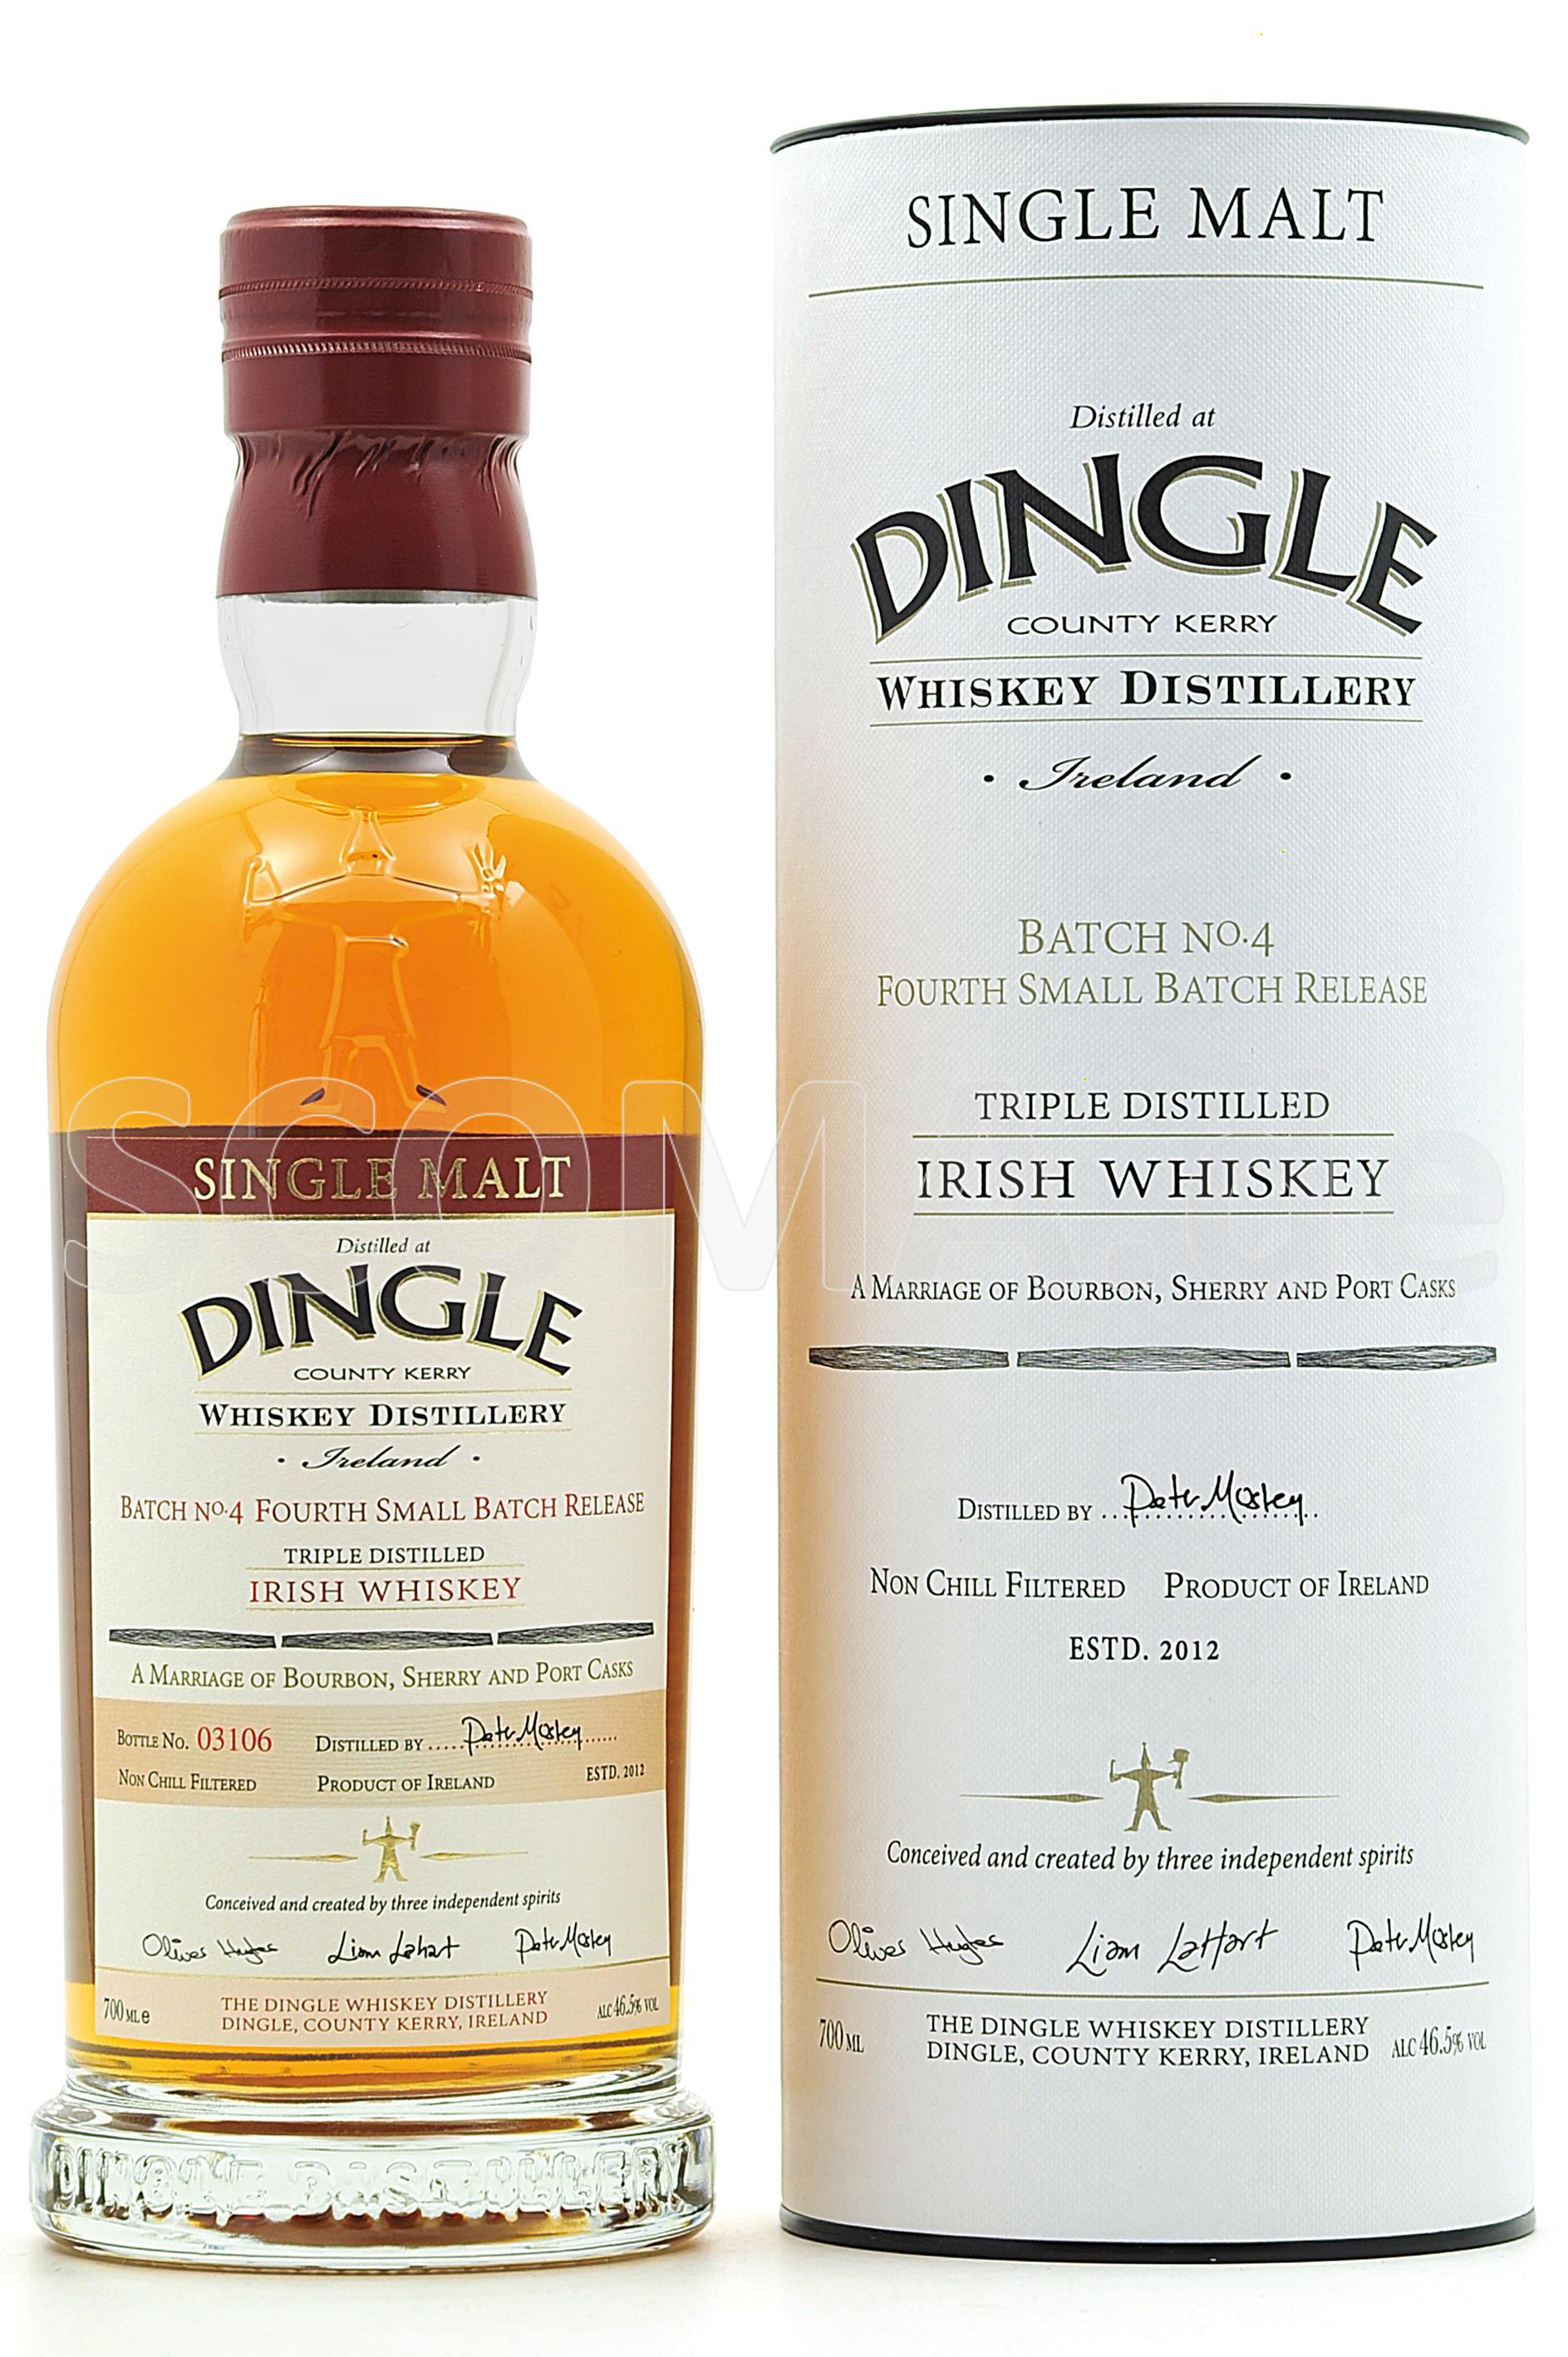 Dingle Single Malt Batch No.4